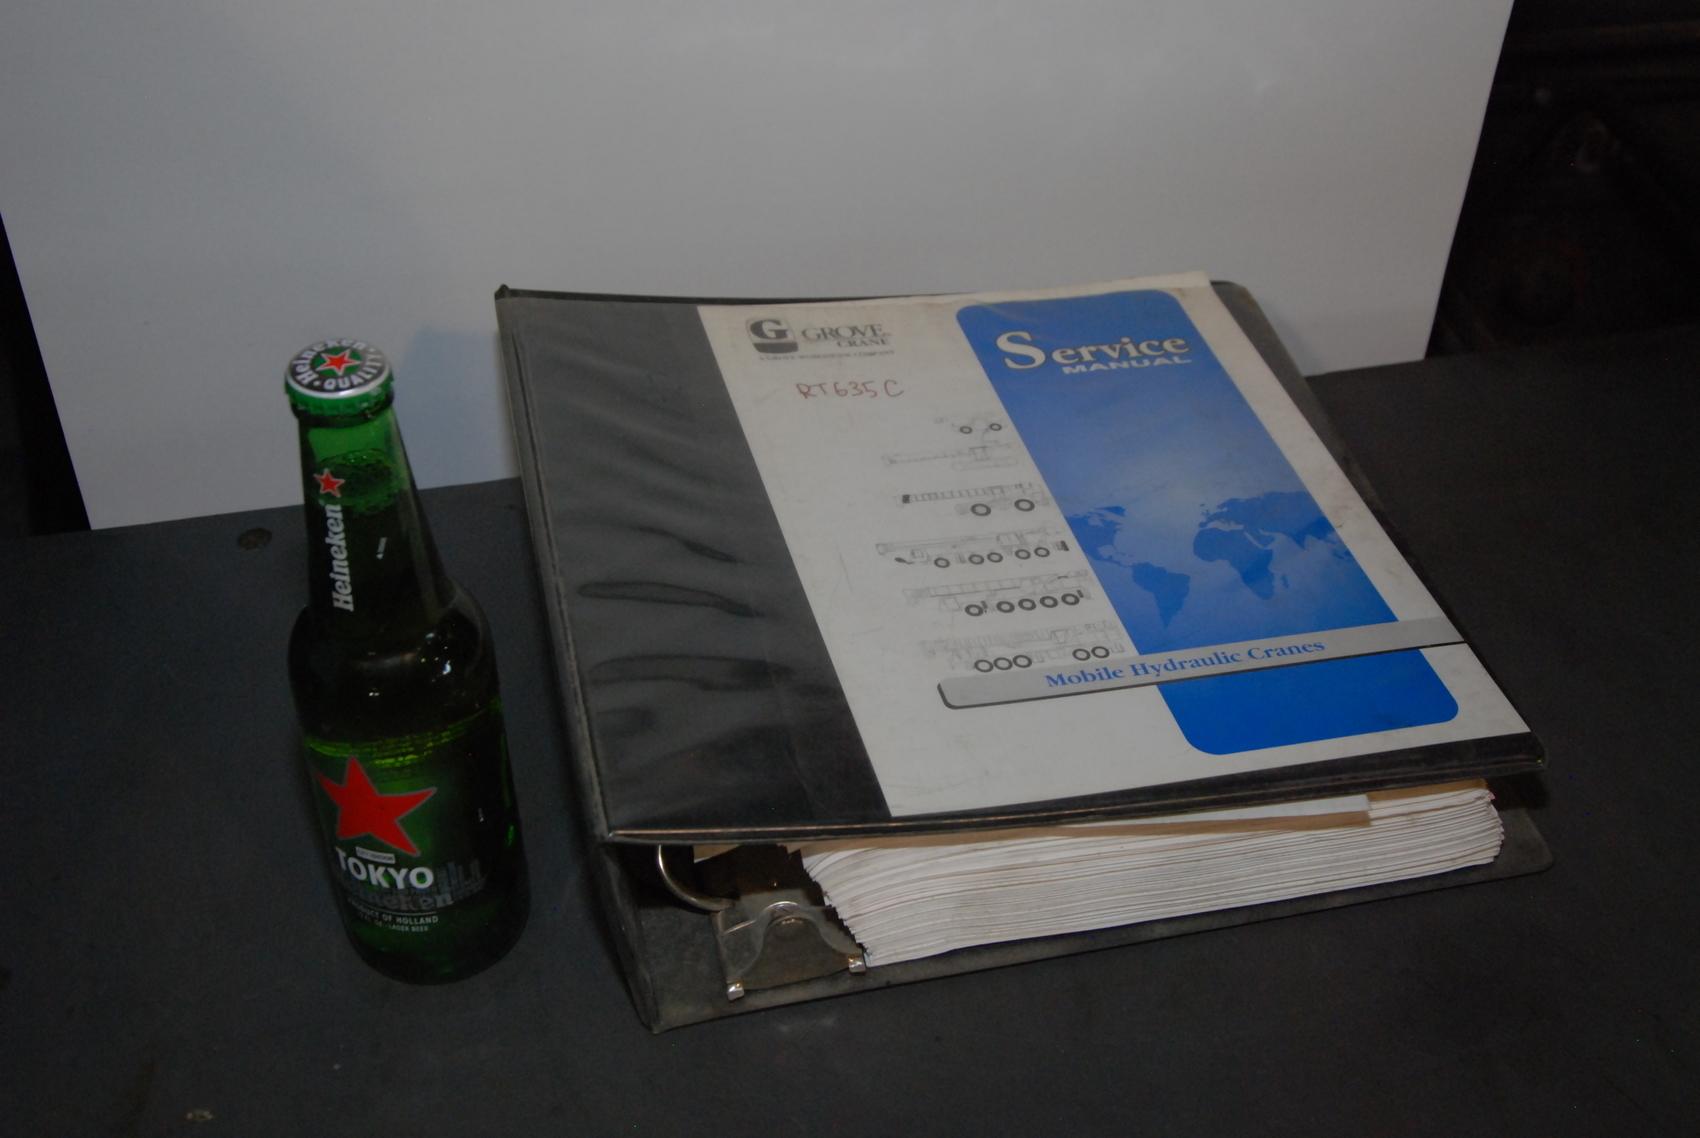 GROVE RT635C Crane maintenance packages manual nopl